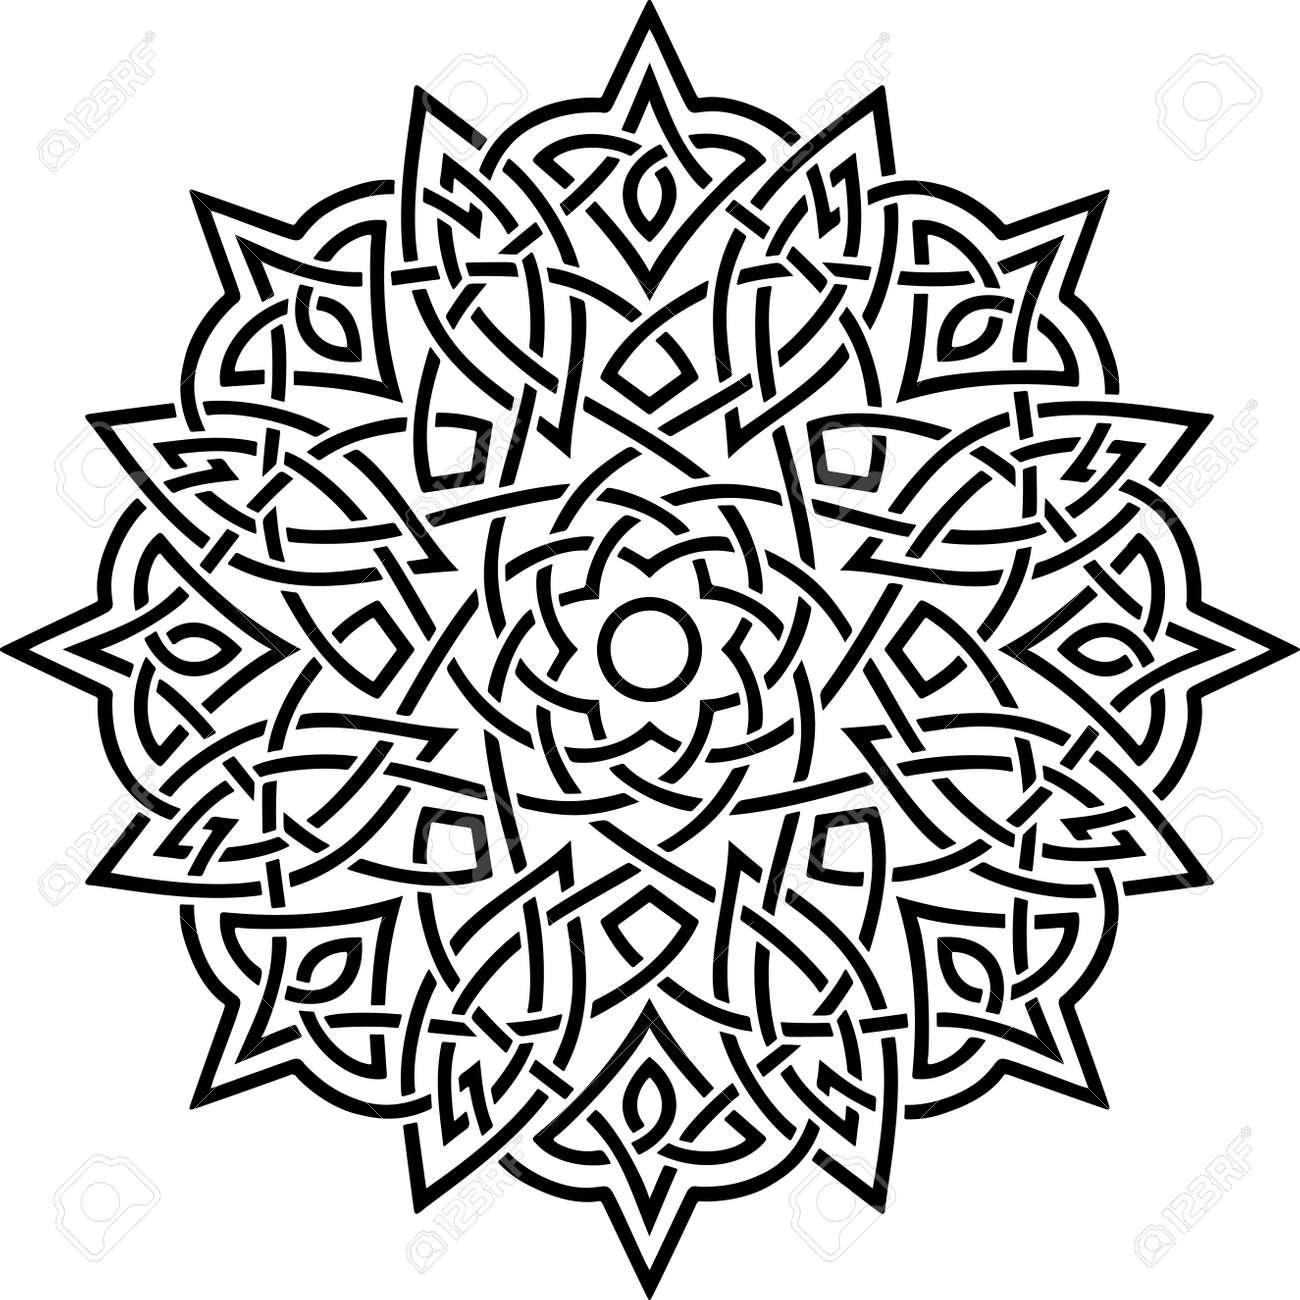 Mandala Pattern Stencil doodles sketch good mood - 167007499